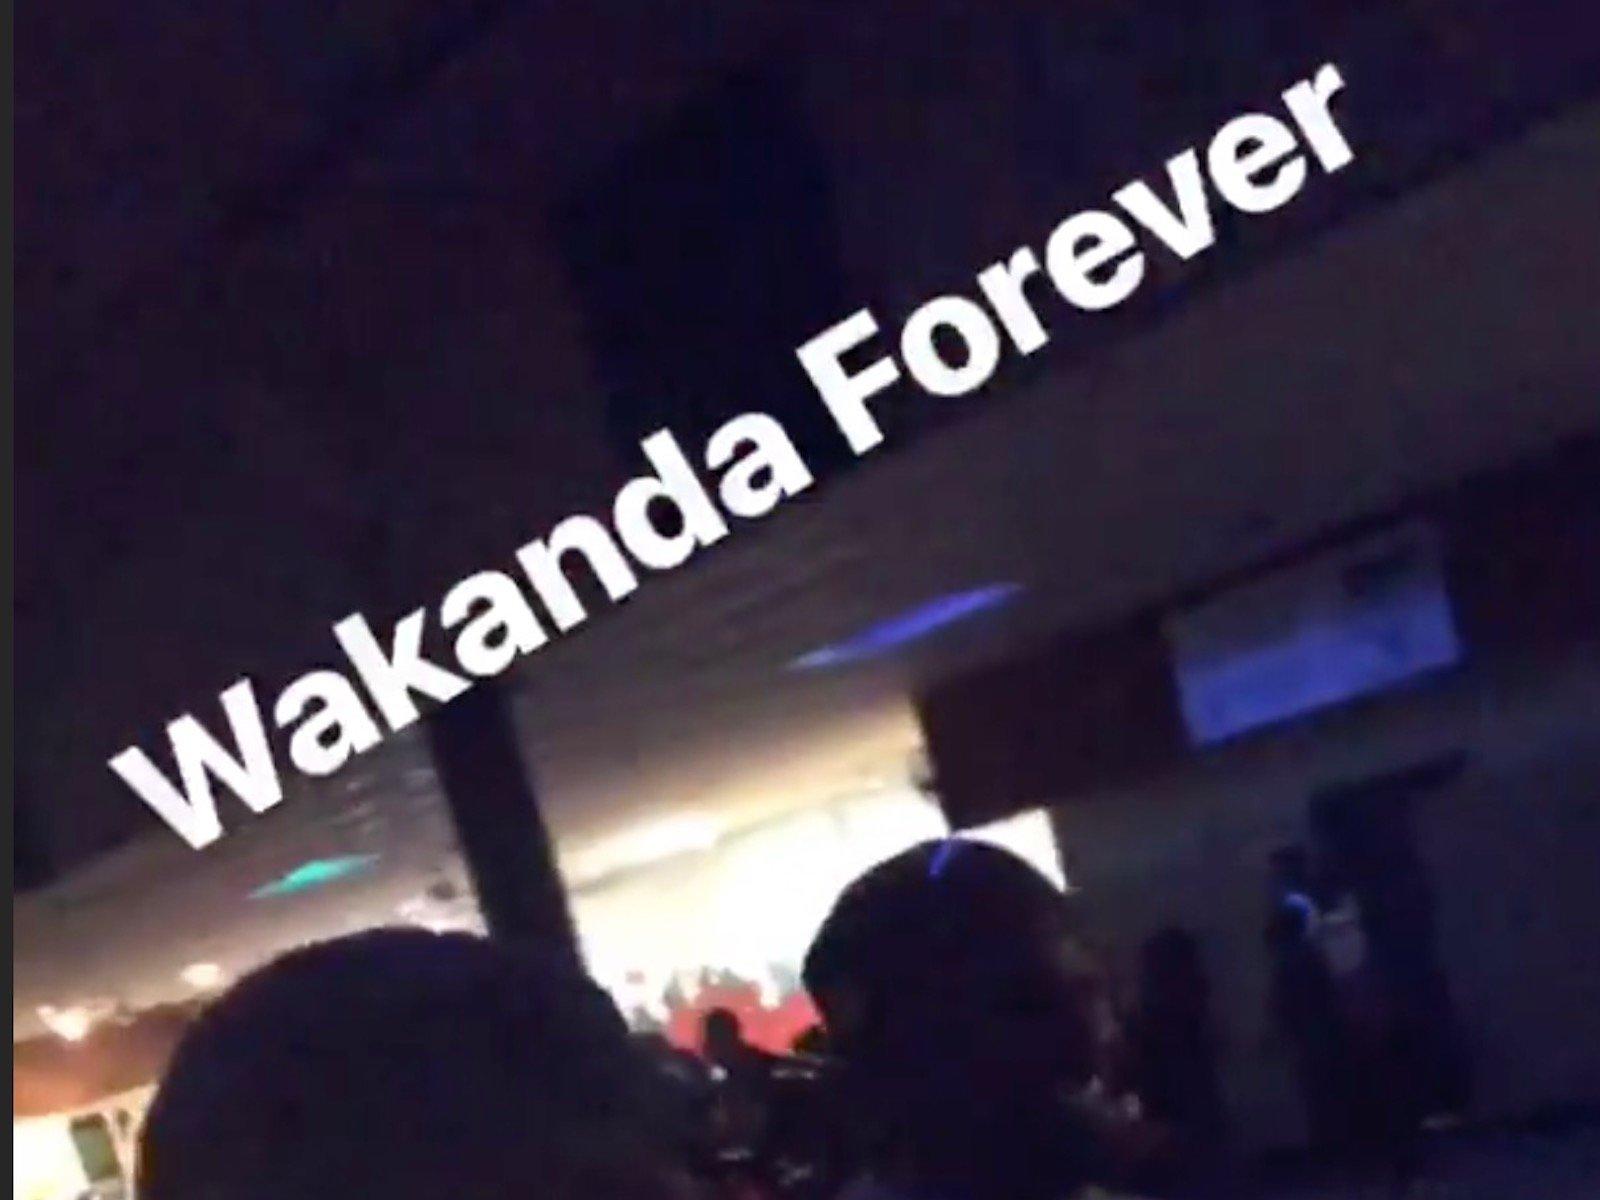 Wakanda Forever LeBron James